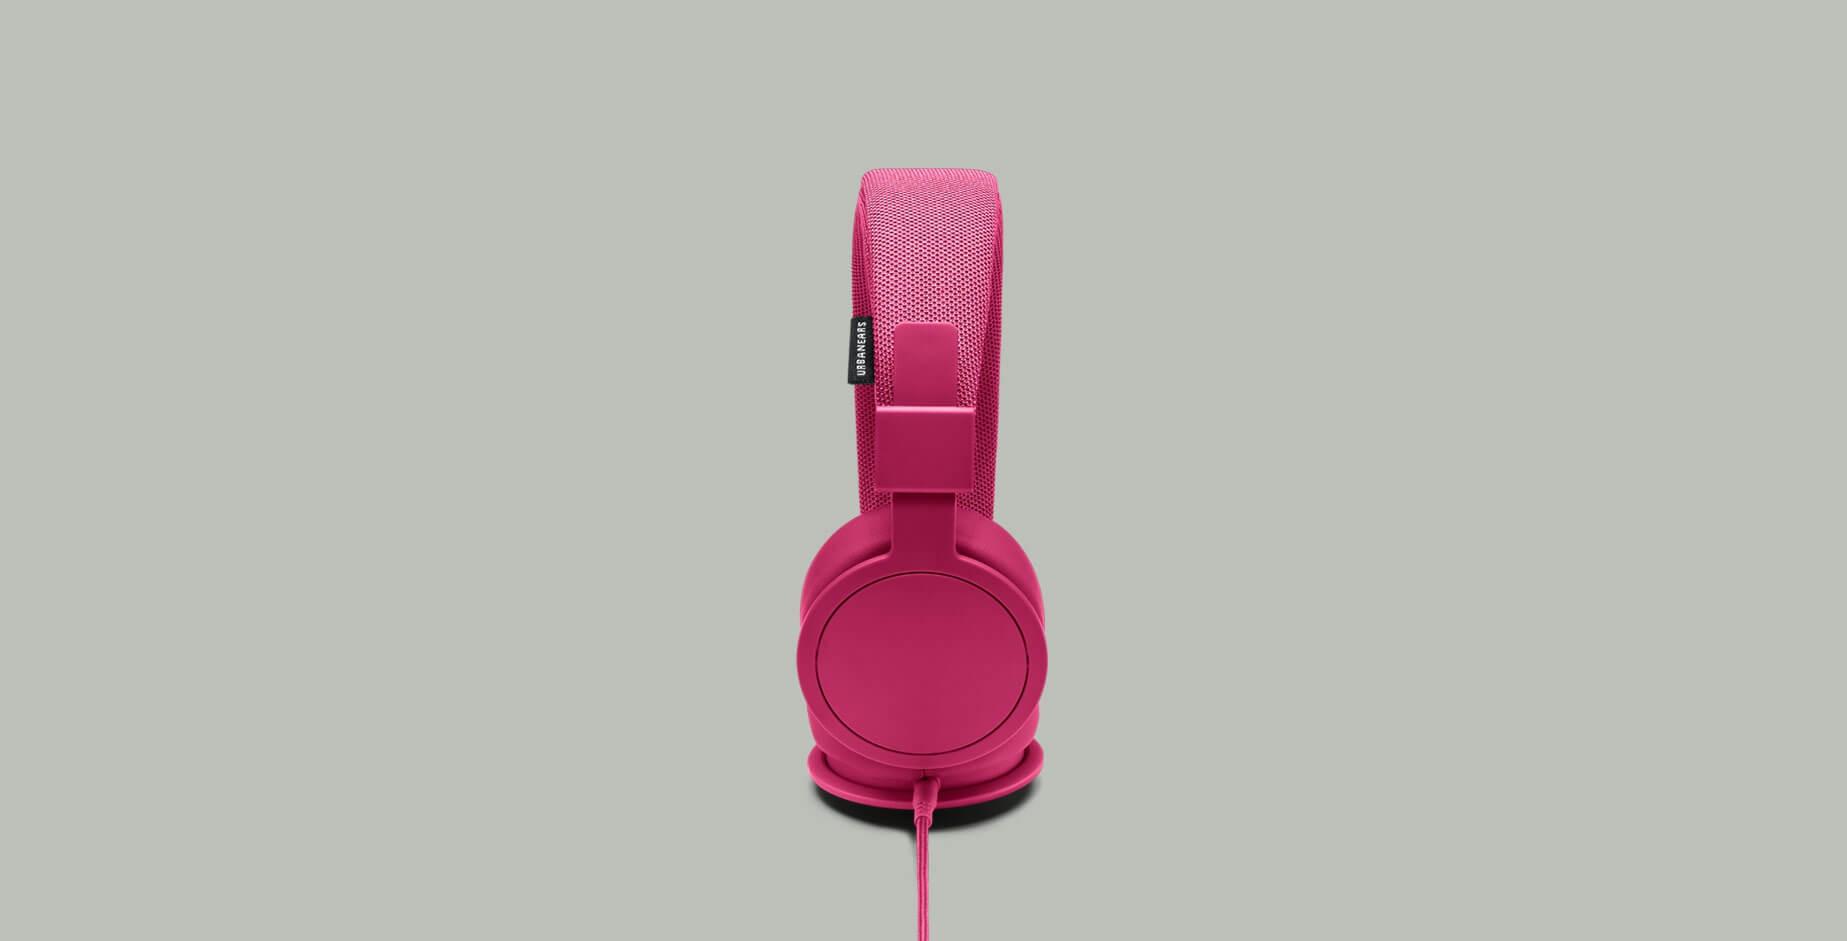 urbanears_headphones_plattanadv_jam_3_3800